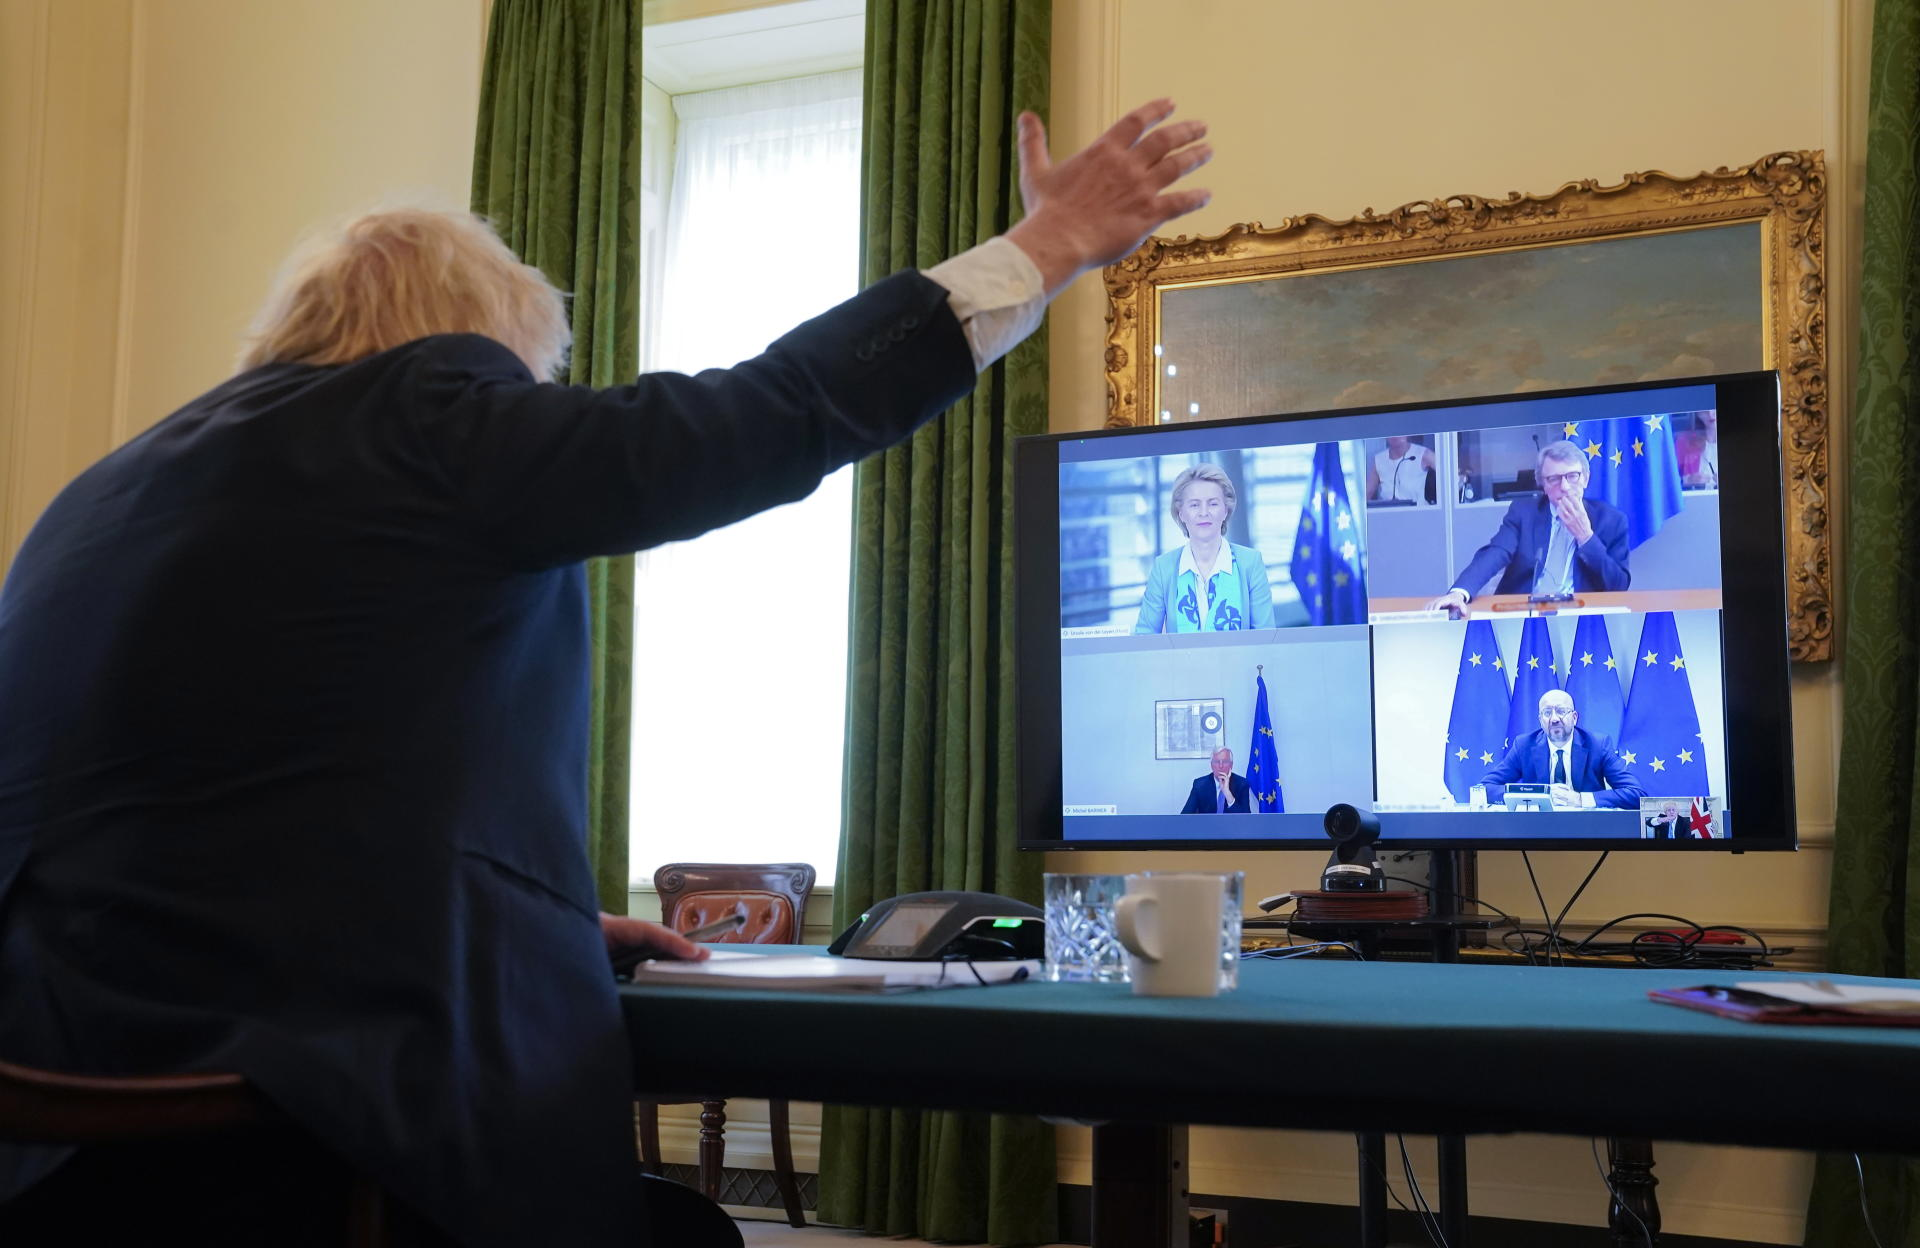 Visite Du 10 Downing Street Residence Officielle Du Premier Ministre Britannique